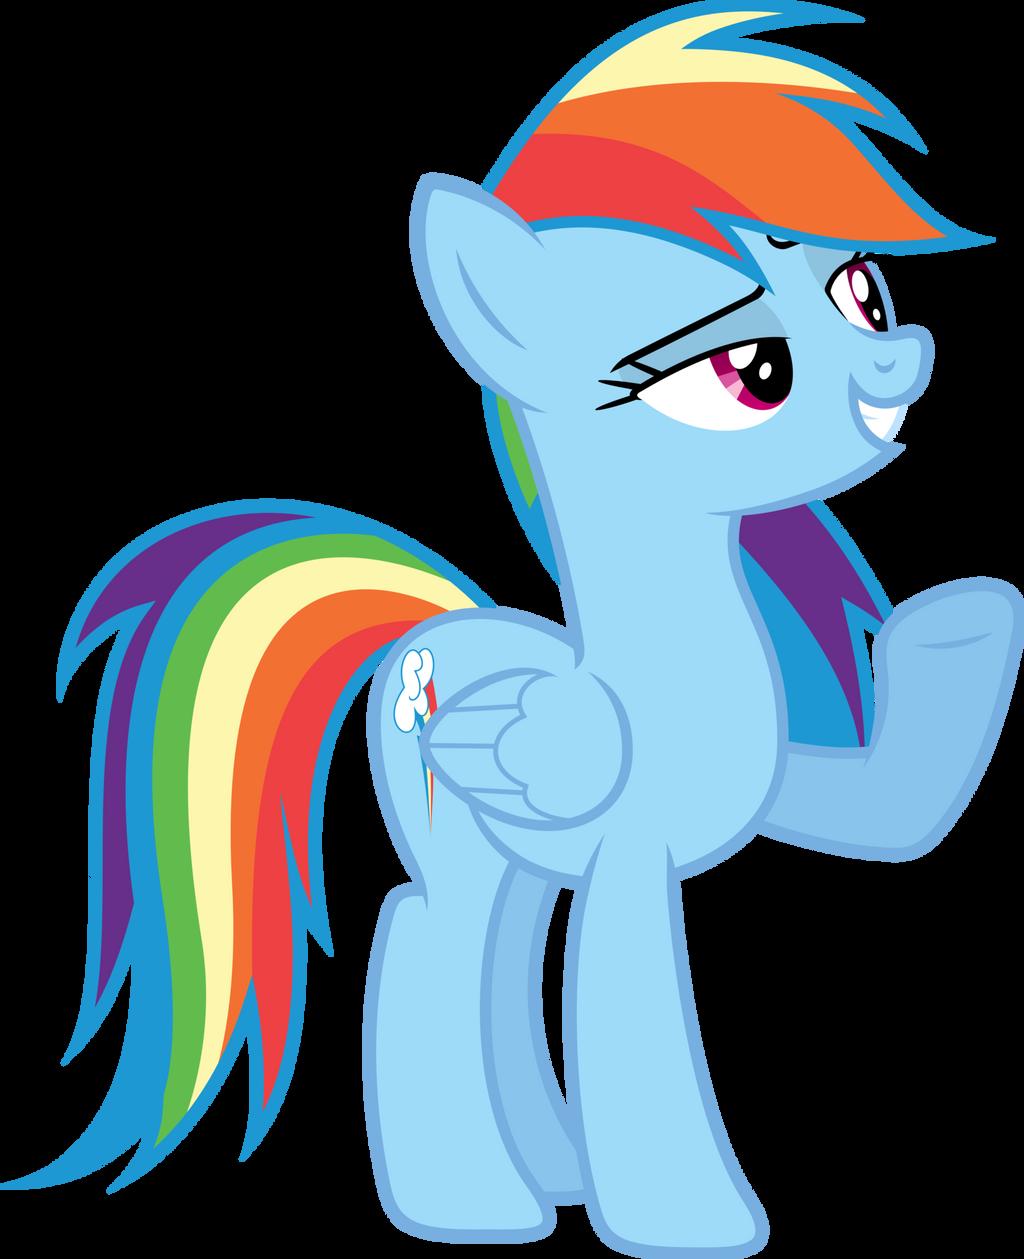 MLP Vector - Rainbow Dash #5 by jhayarr23 on DeviantArt